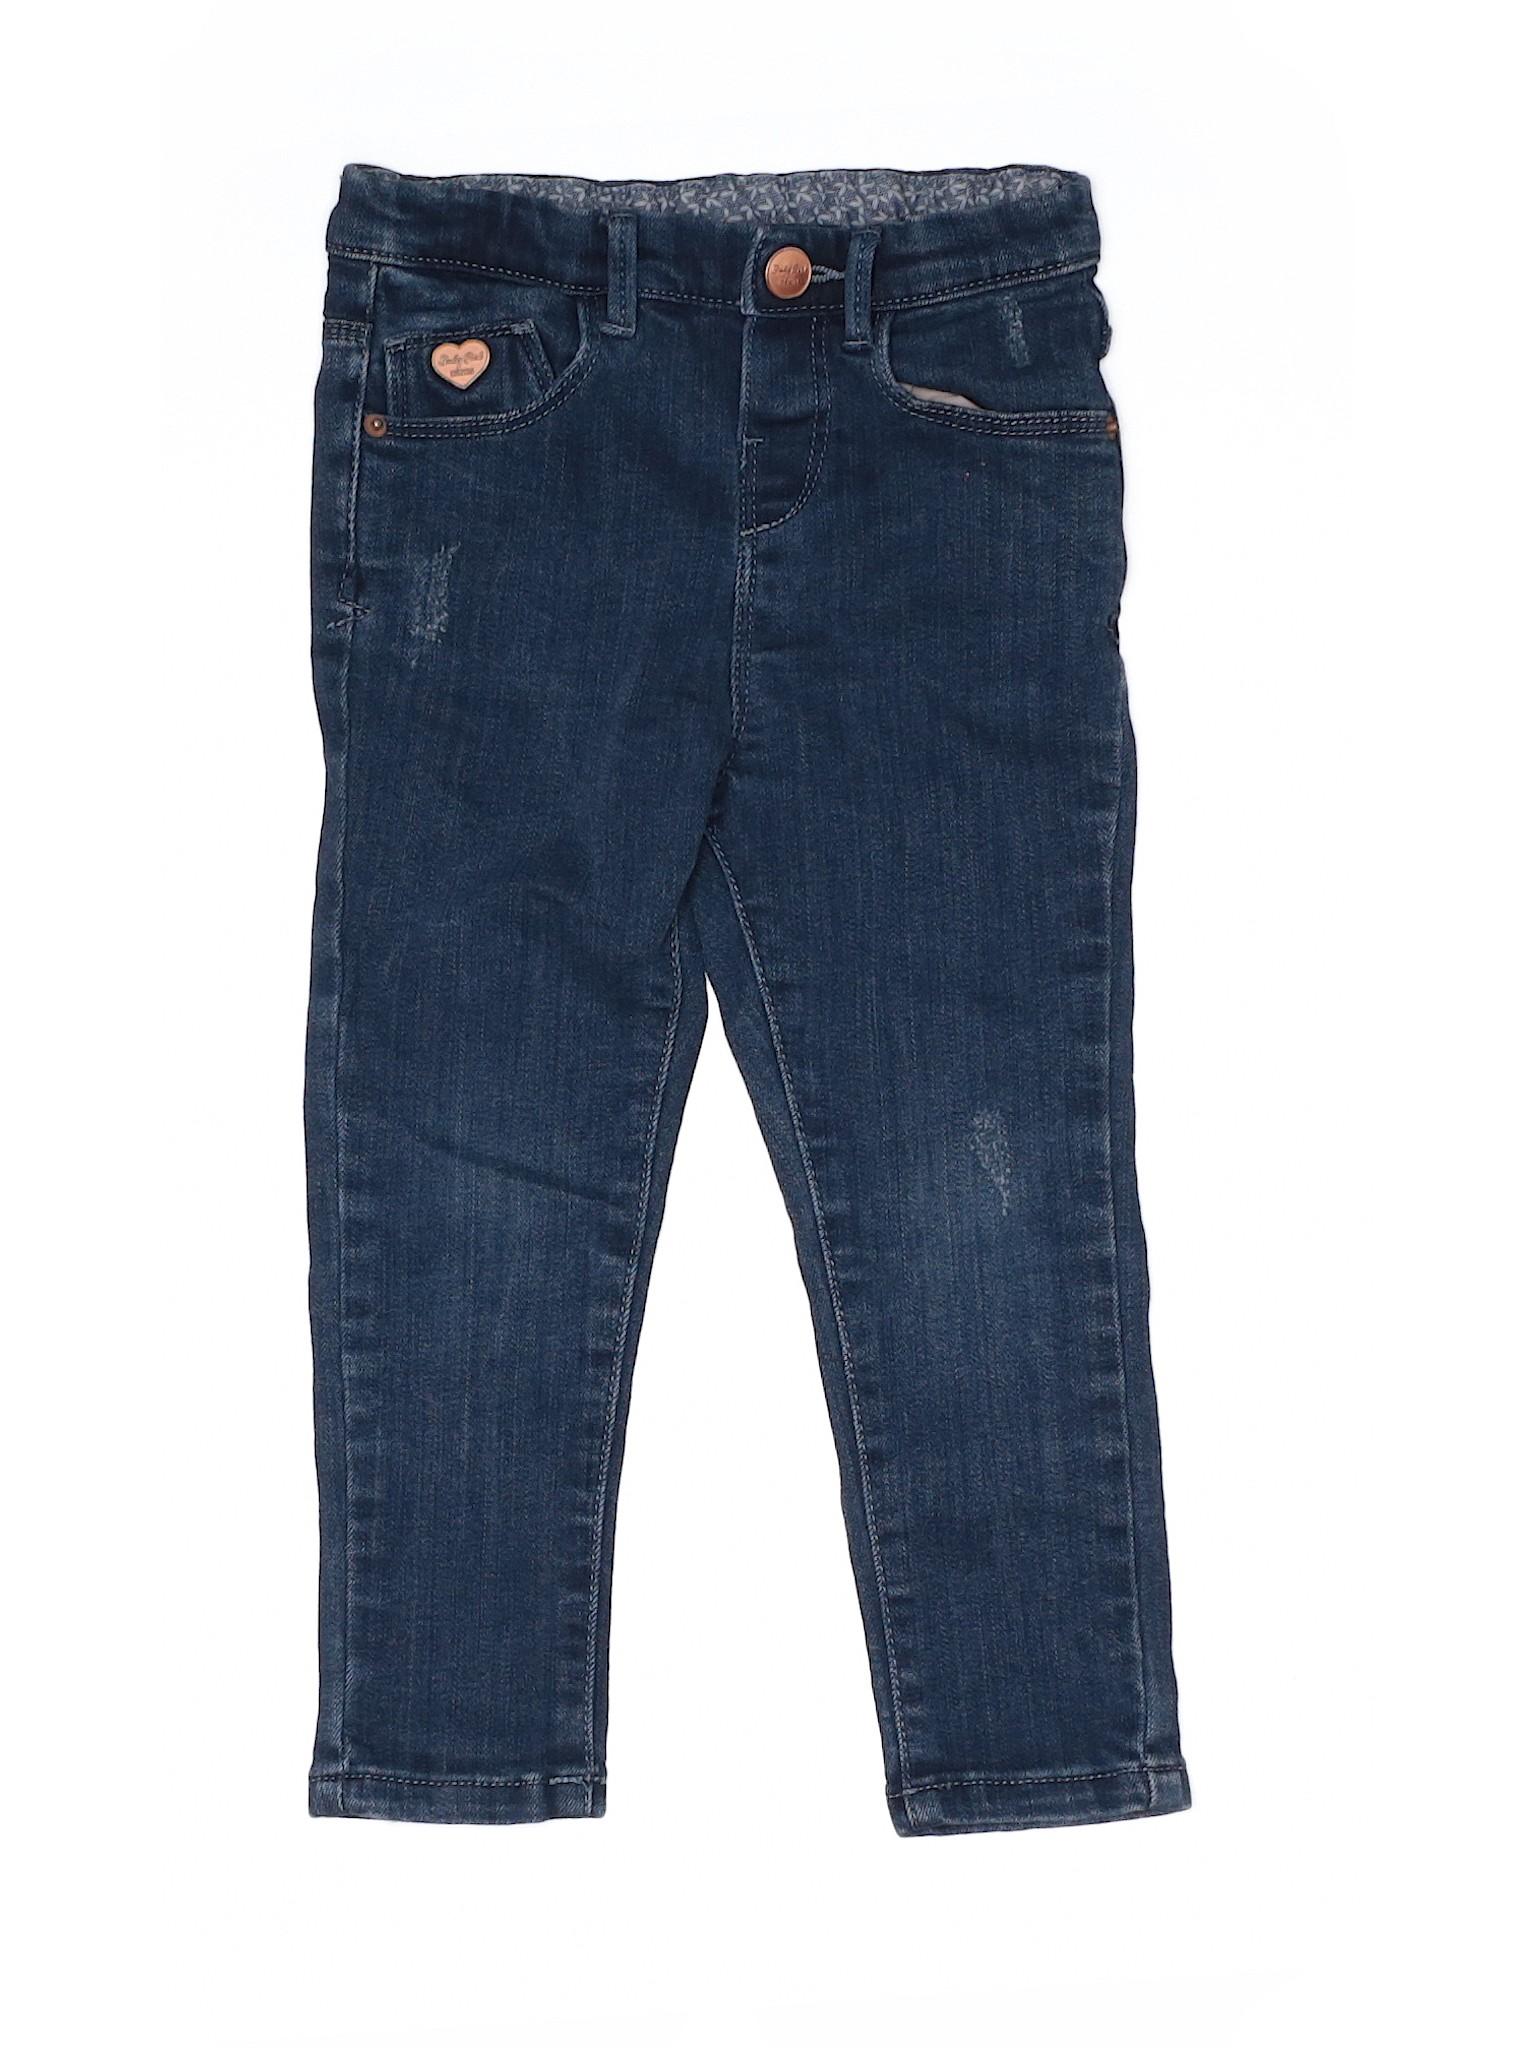 1db9305d Jeans